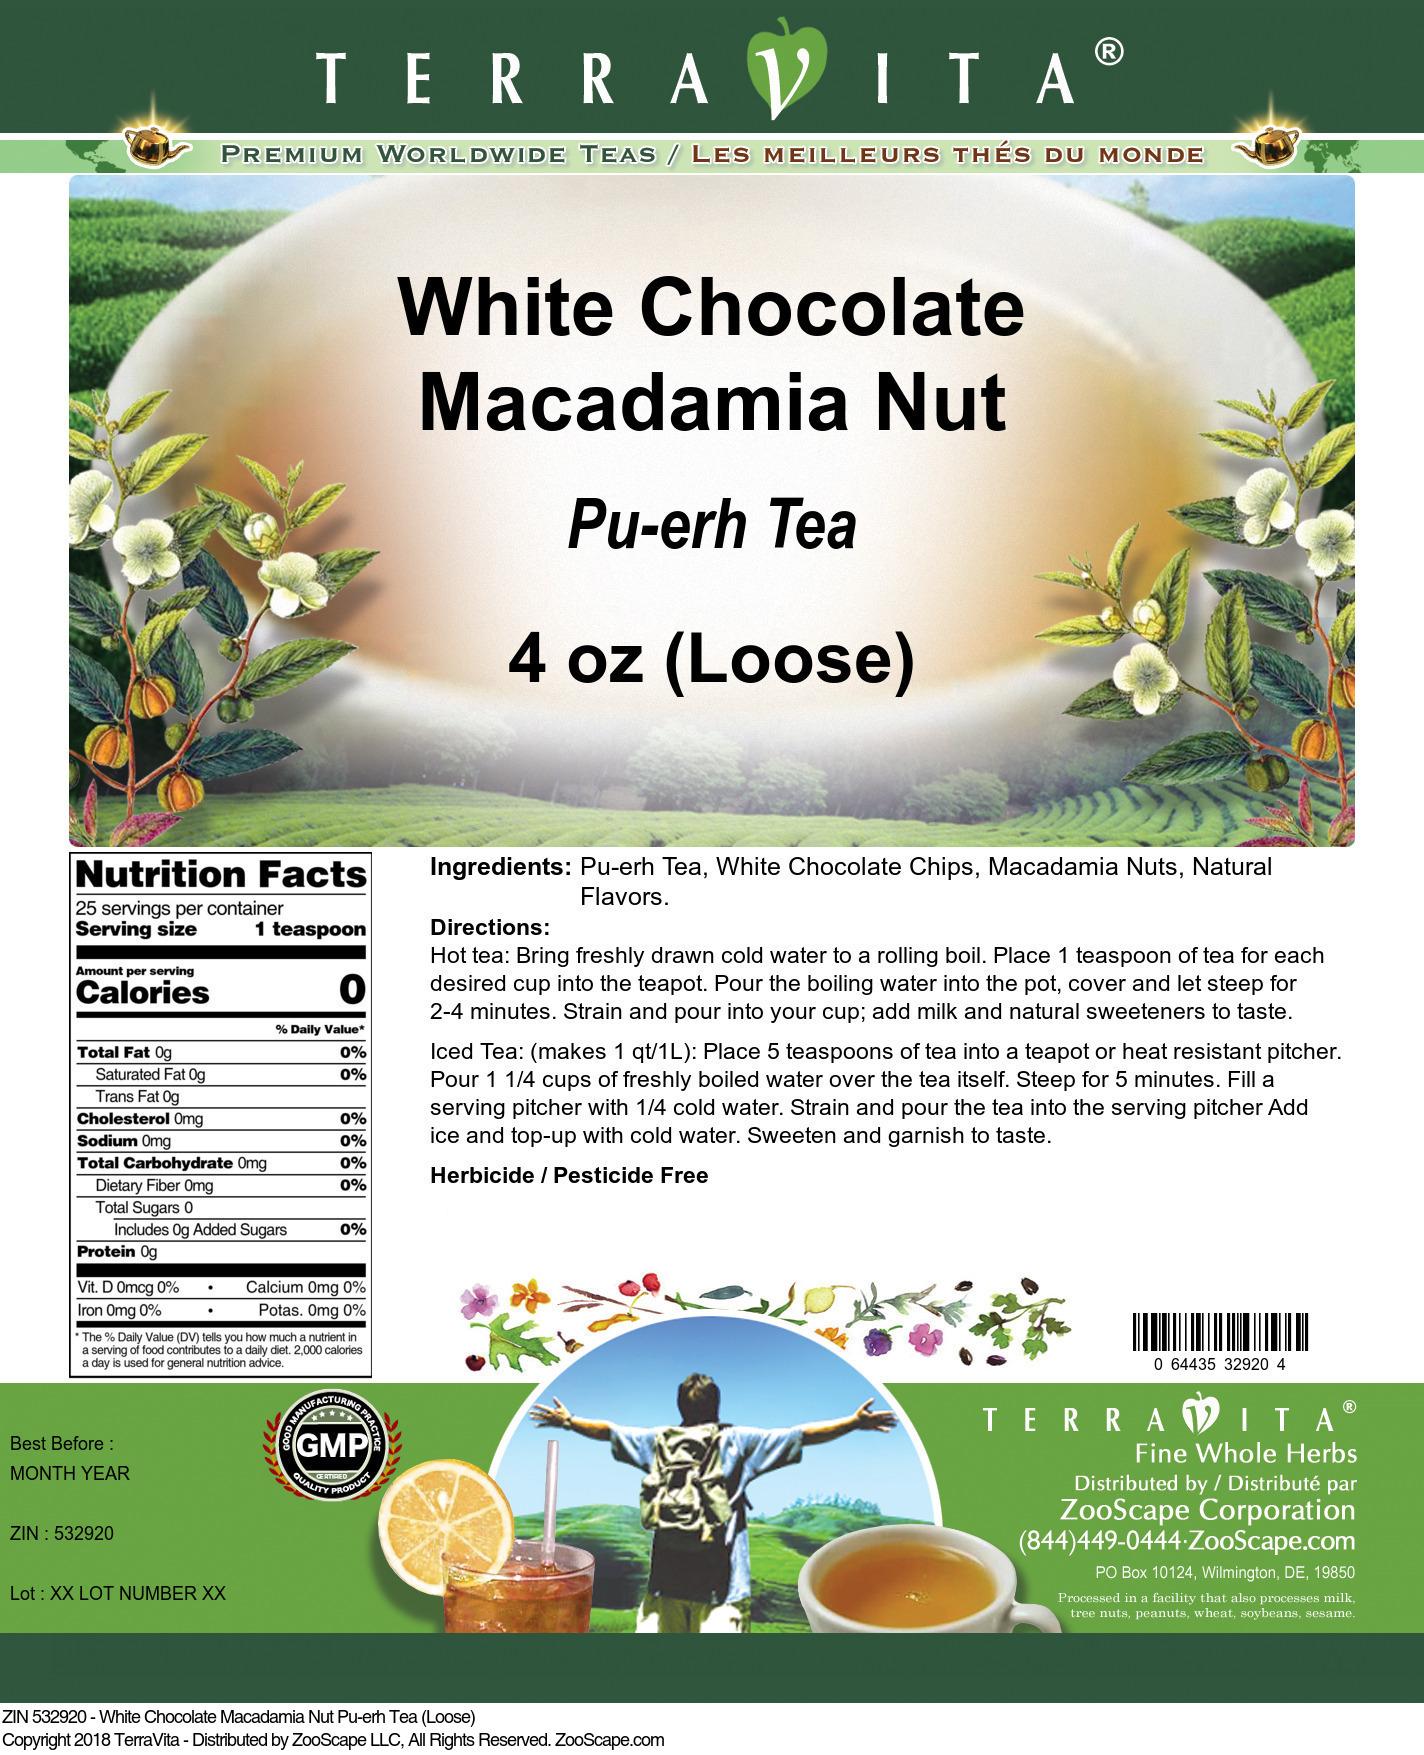 White Chocolate Macadamia Nut Pu-erh Tea (Loose)